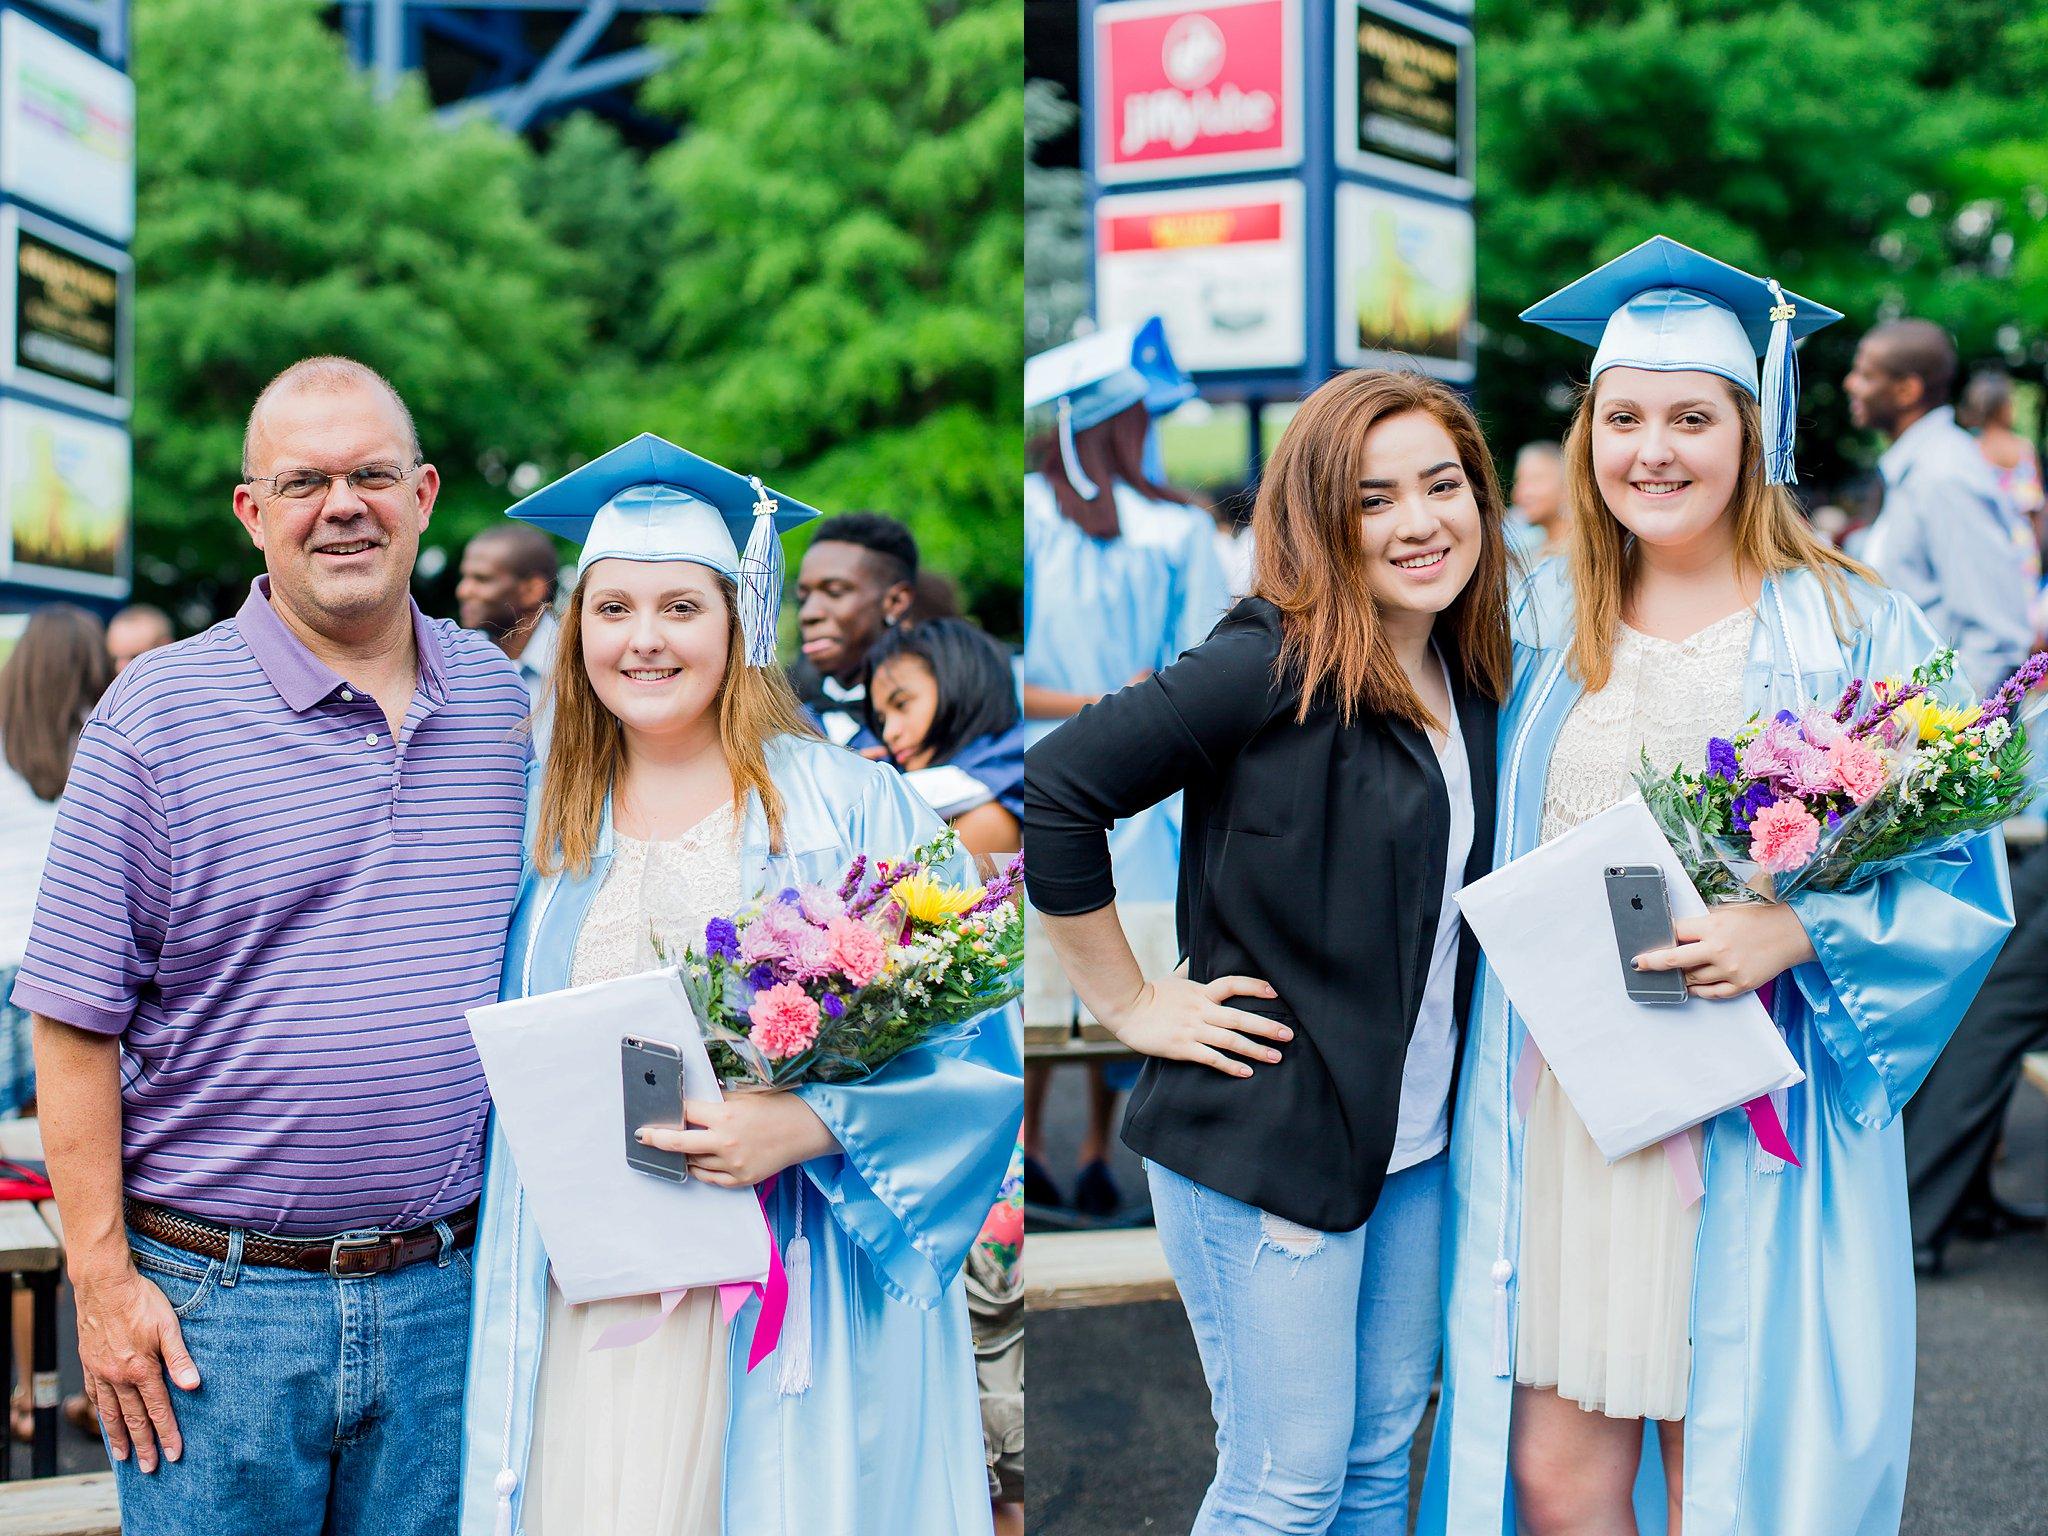 Potomac Senior High School Graduation Class of 2015-6565.jpg